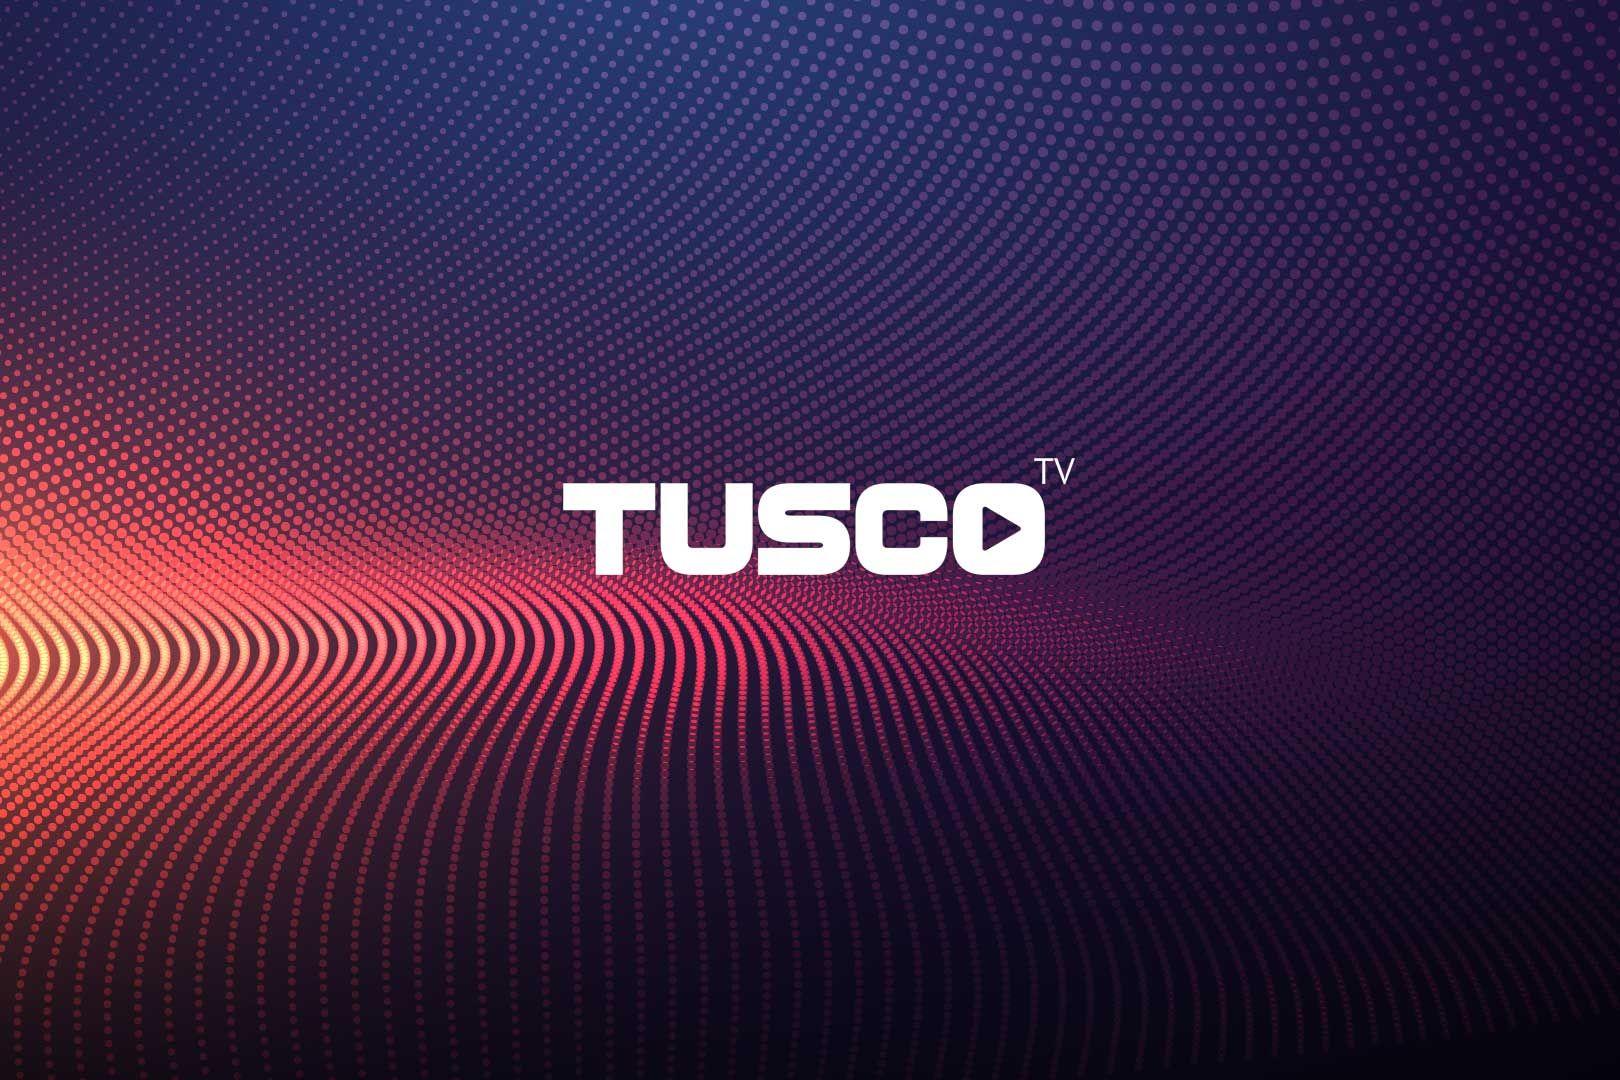 tuscarawas-county-news-sports-business-tusco-tv-television.jpg